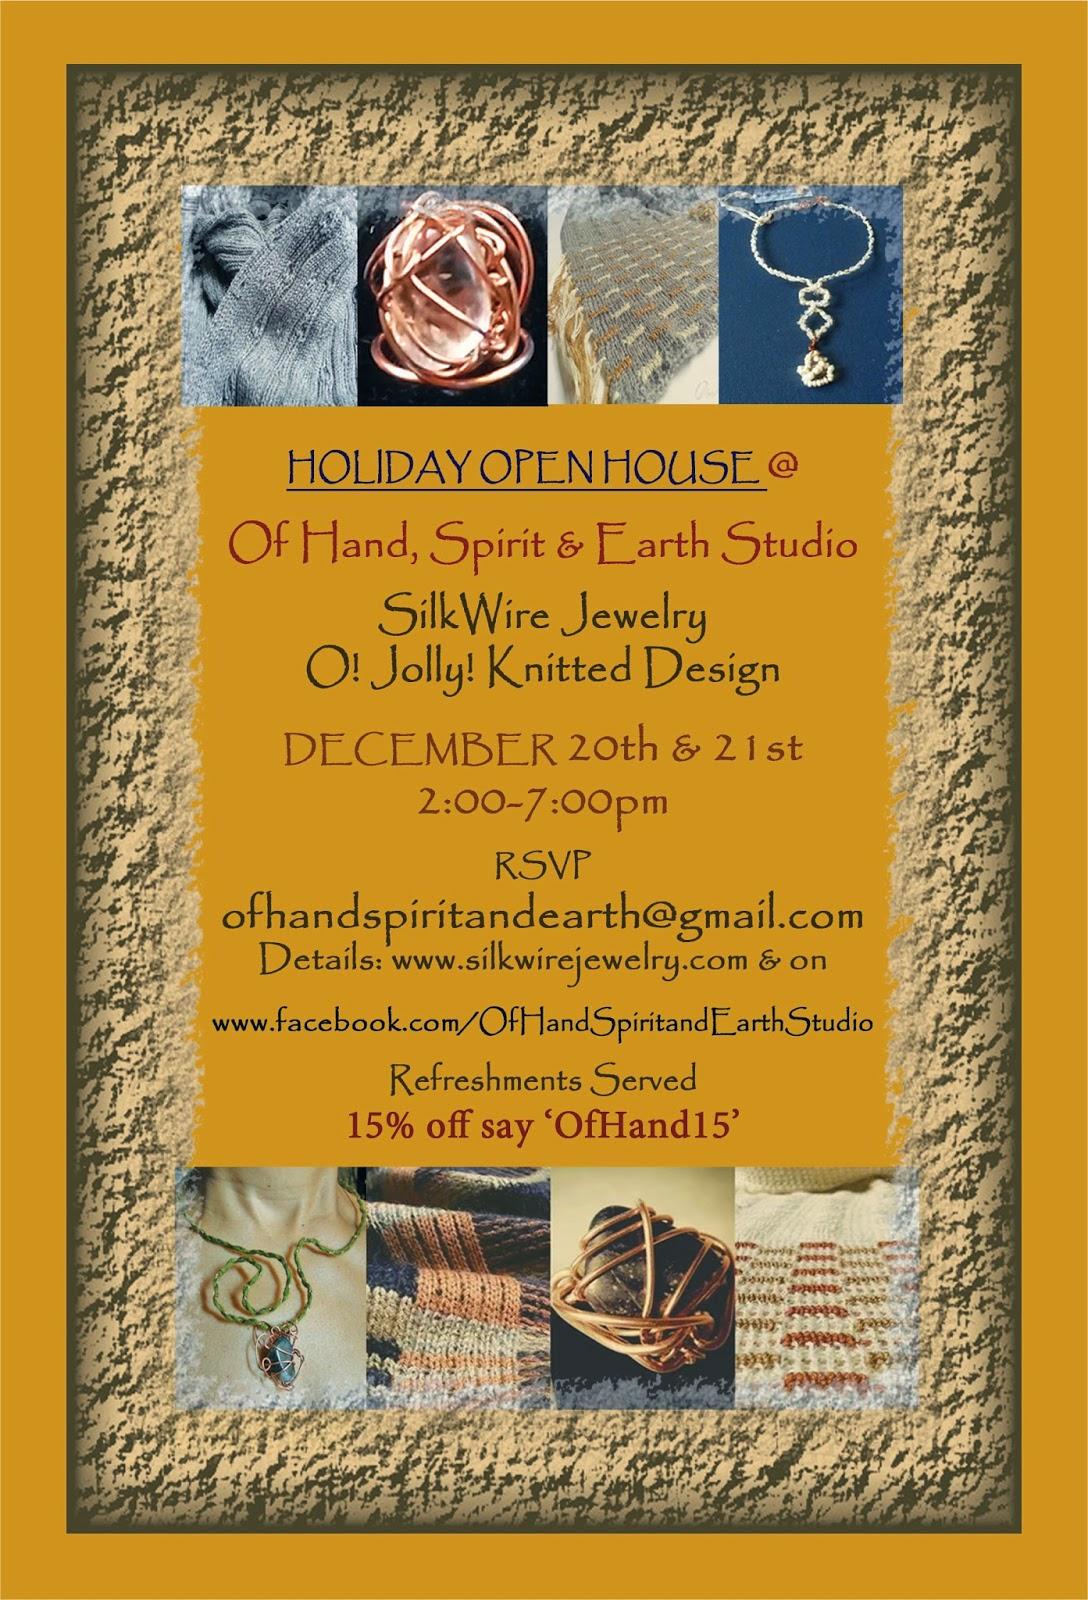 Of Hand, Spirit & Earth Studio Holiday Open House